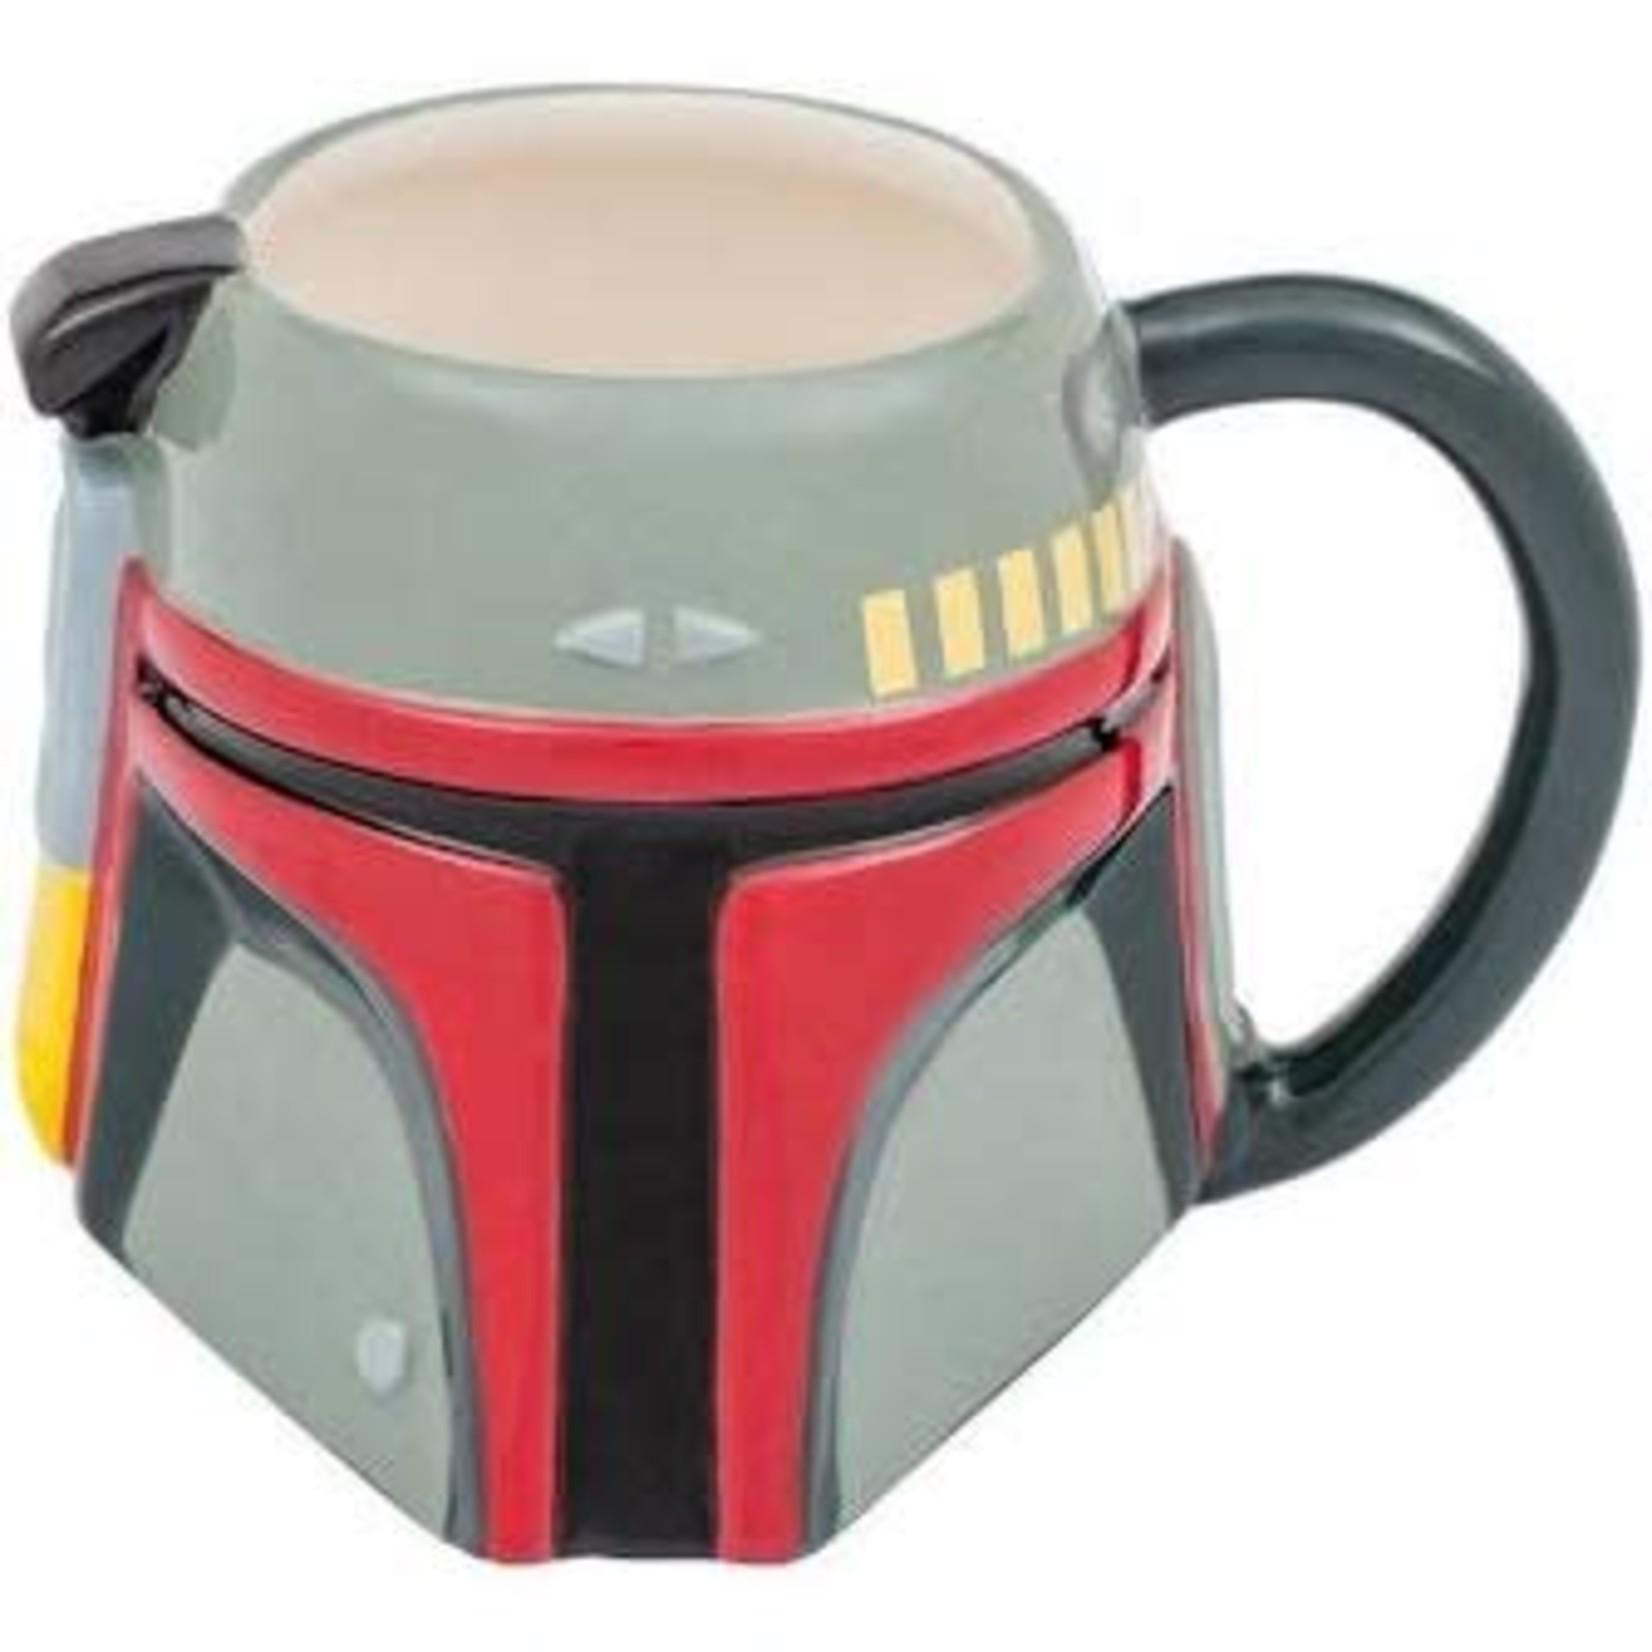 Mug - Boba Fett Boxed Mug